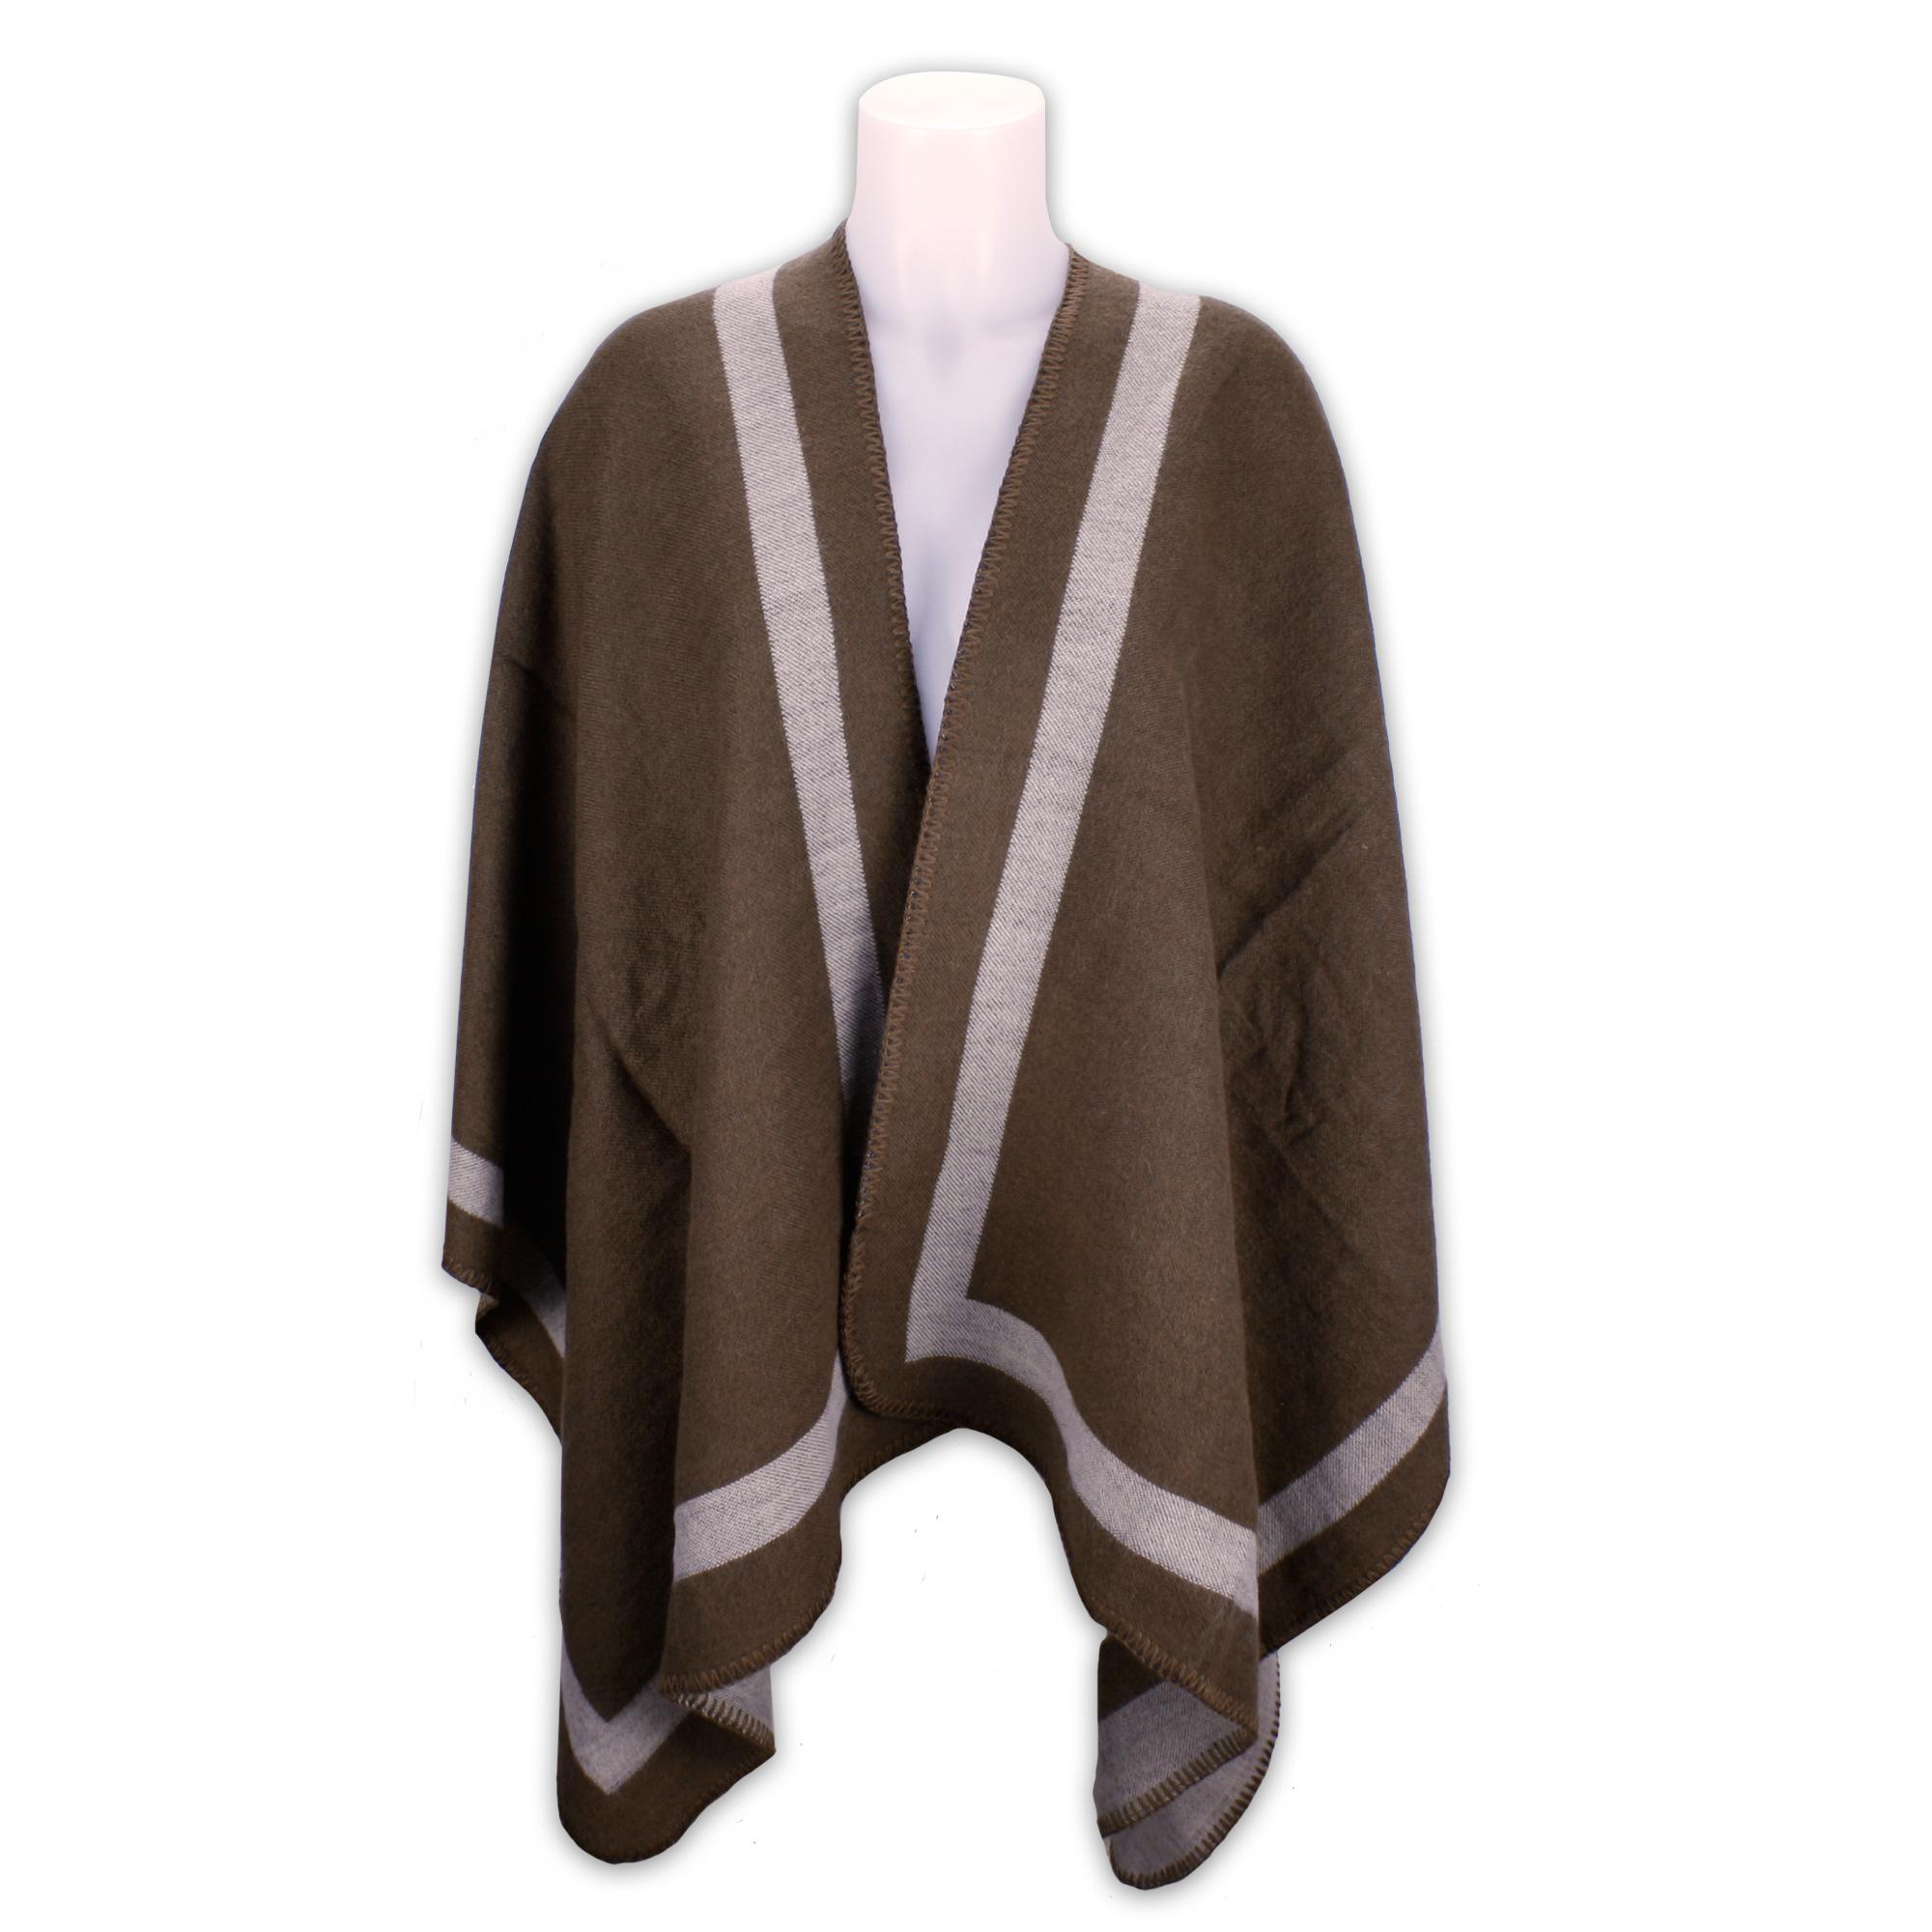 poncho mit wolle cape umhang bergangsjacke mantel. Black Bedroom Furniture Sets. Home Design Ideas